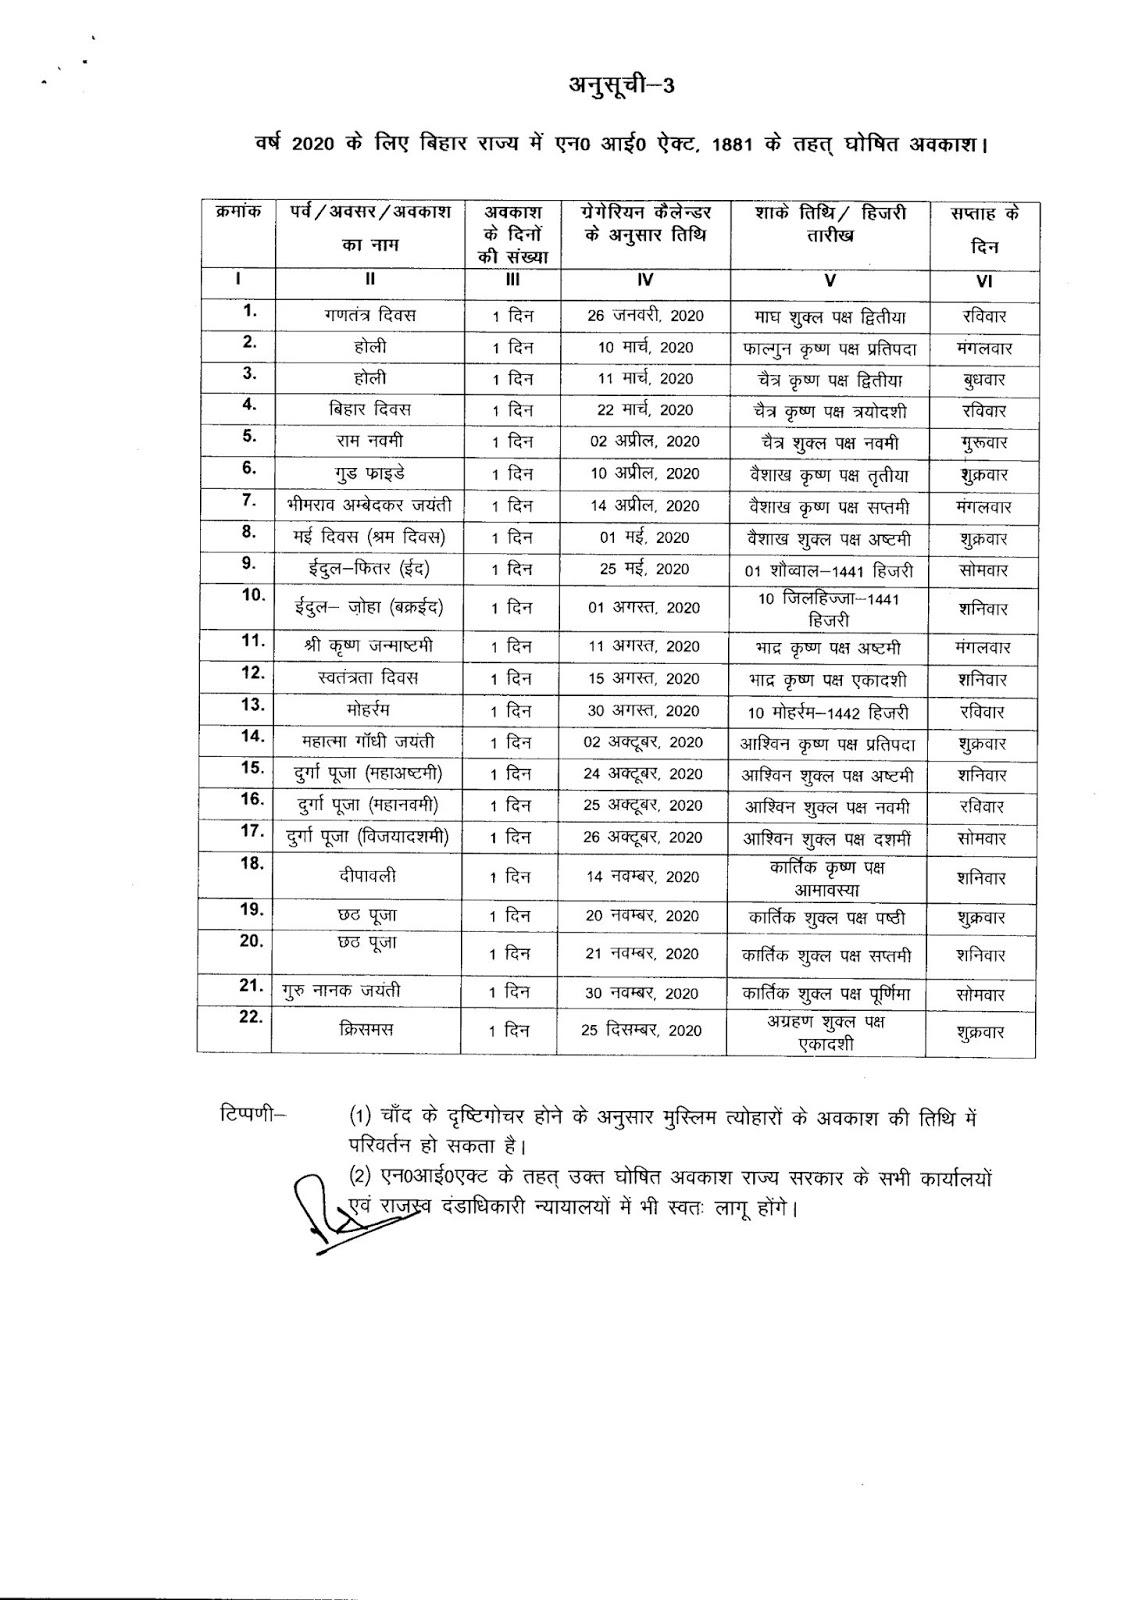 Bihar Sarkar Calendra 2020 | Calendar For Planning inside Calendar 2018 Bihar Sarkar